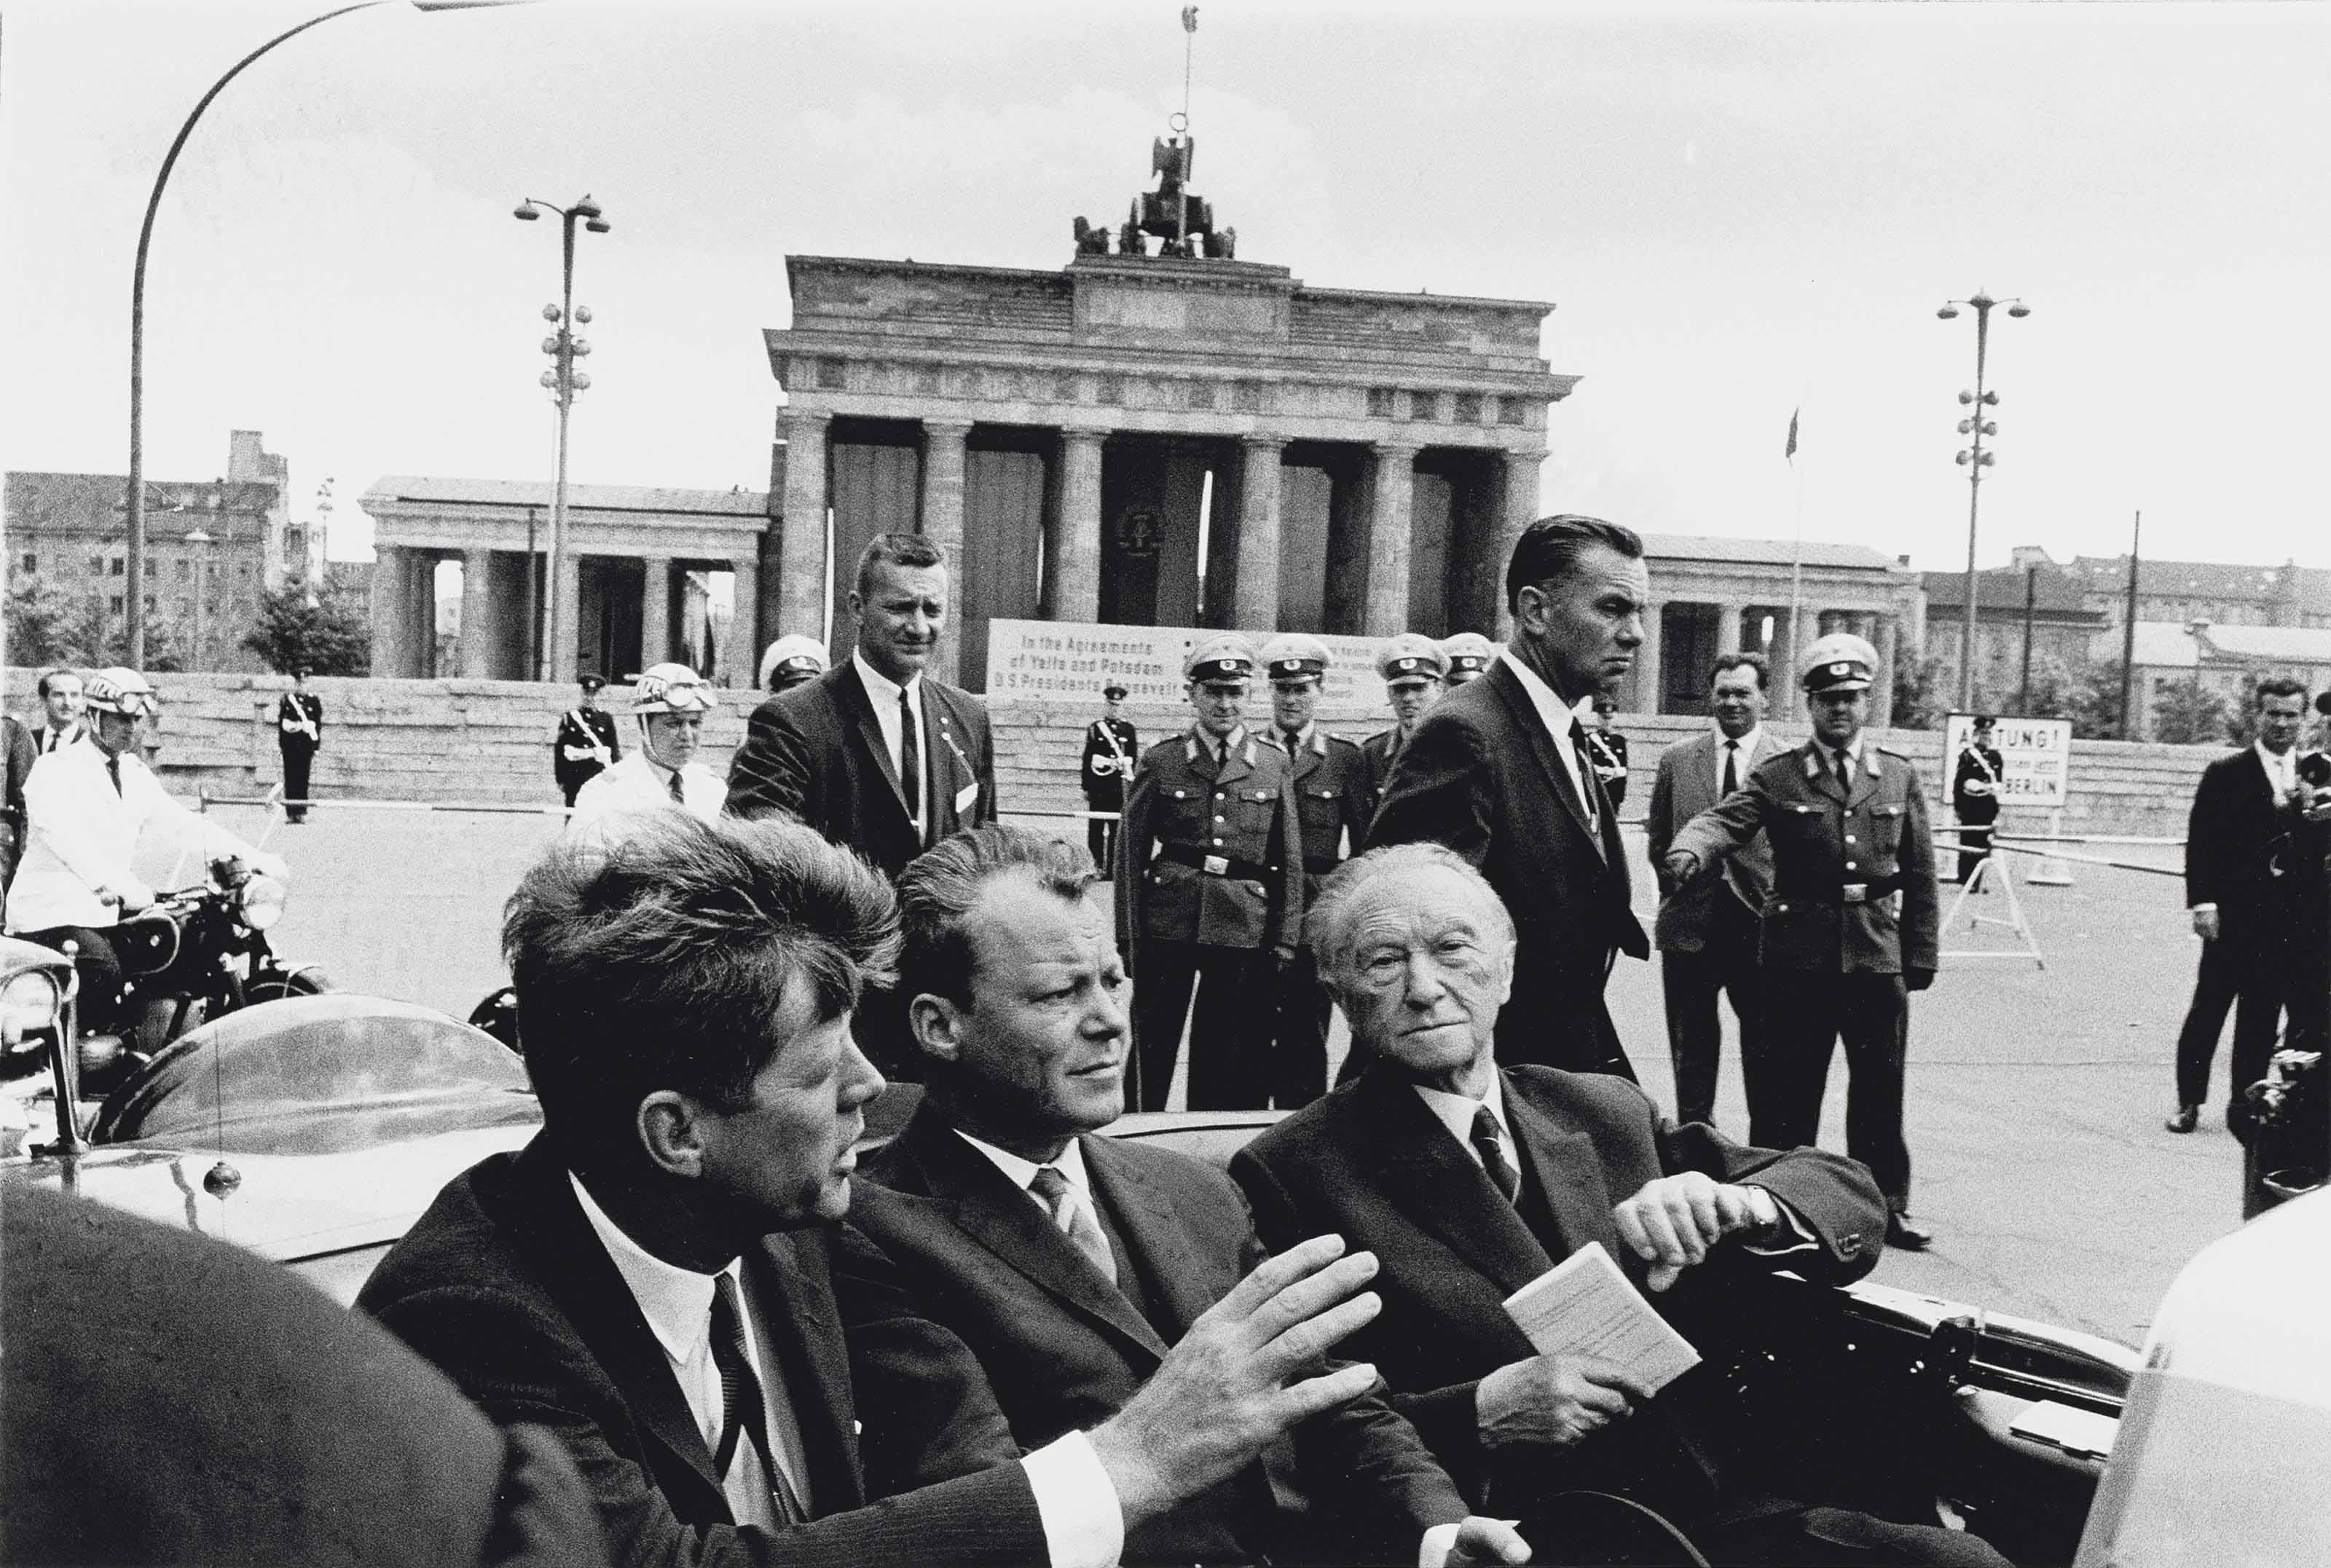 John F. Kennedy, Willy Brandt and Konrad Andenauer just leaving the Brandenburg Gate, Berlin, 1963